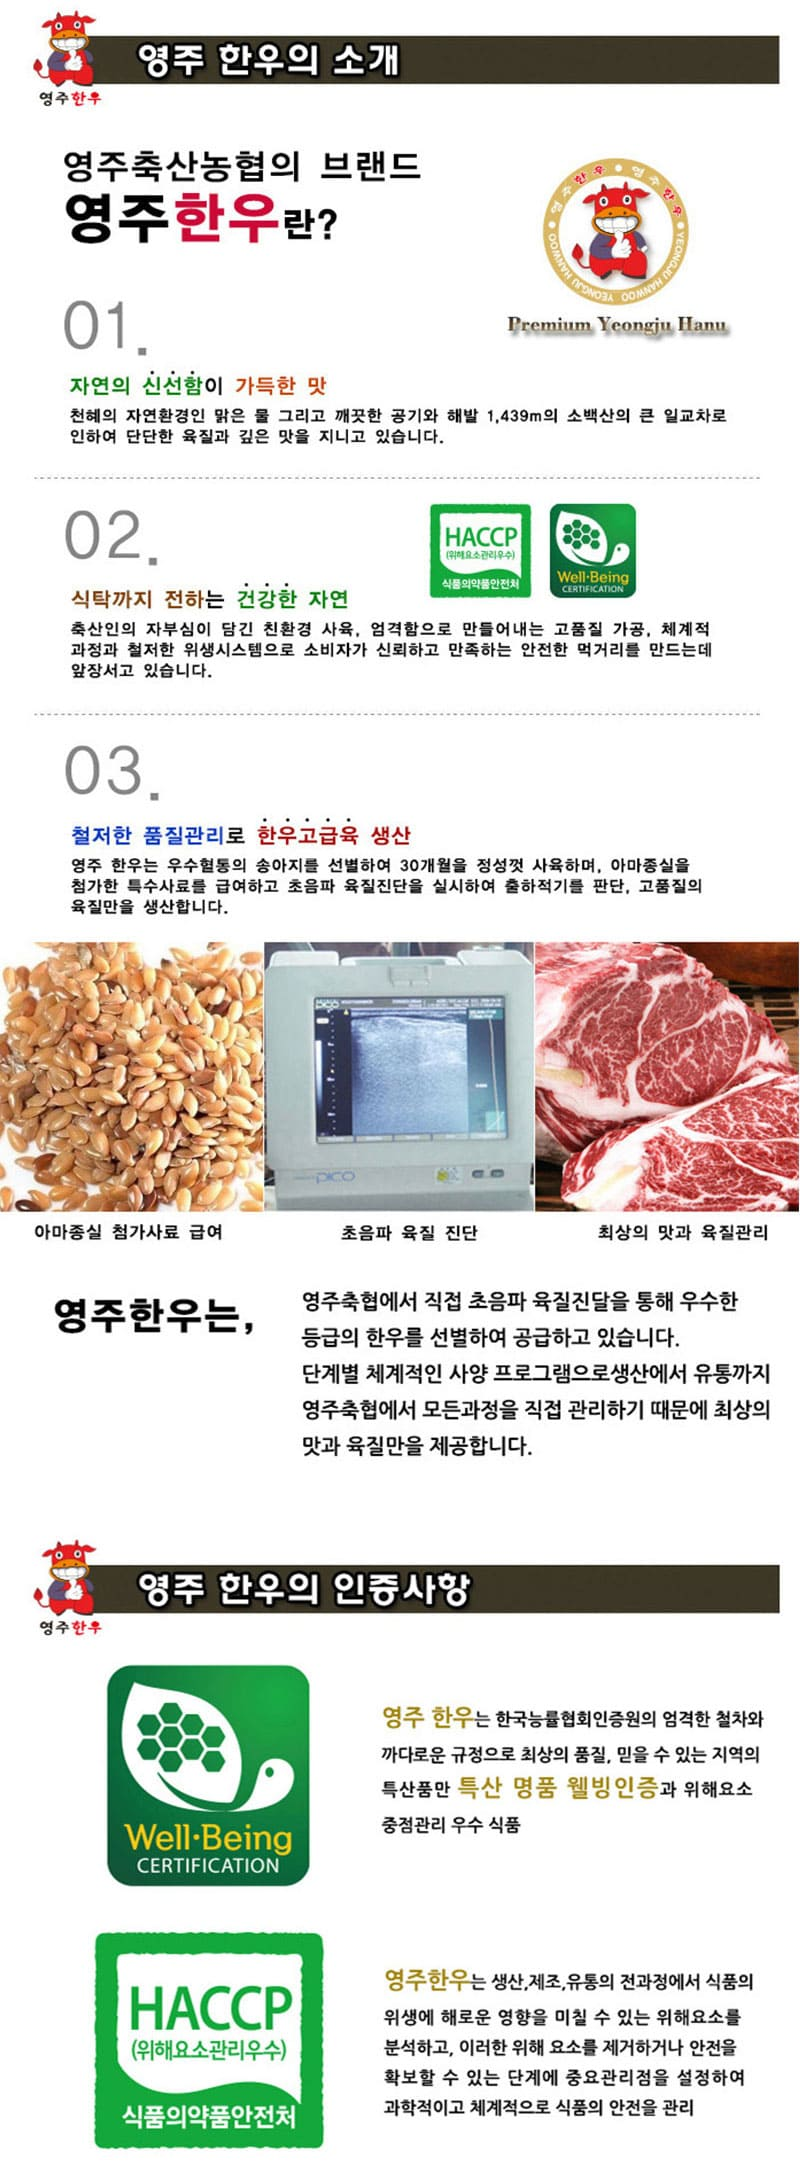 yeongjuchughyeob-myeongpum-set_detail_10.jpg